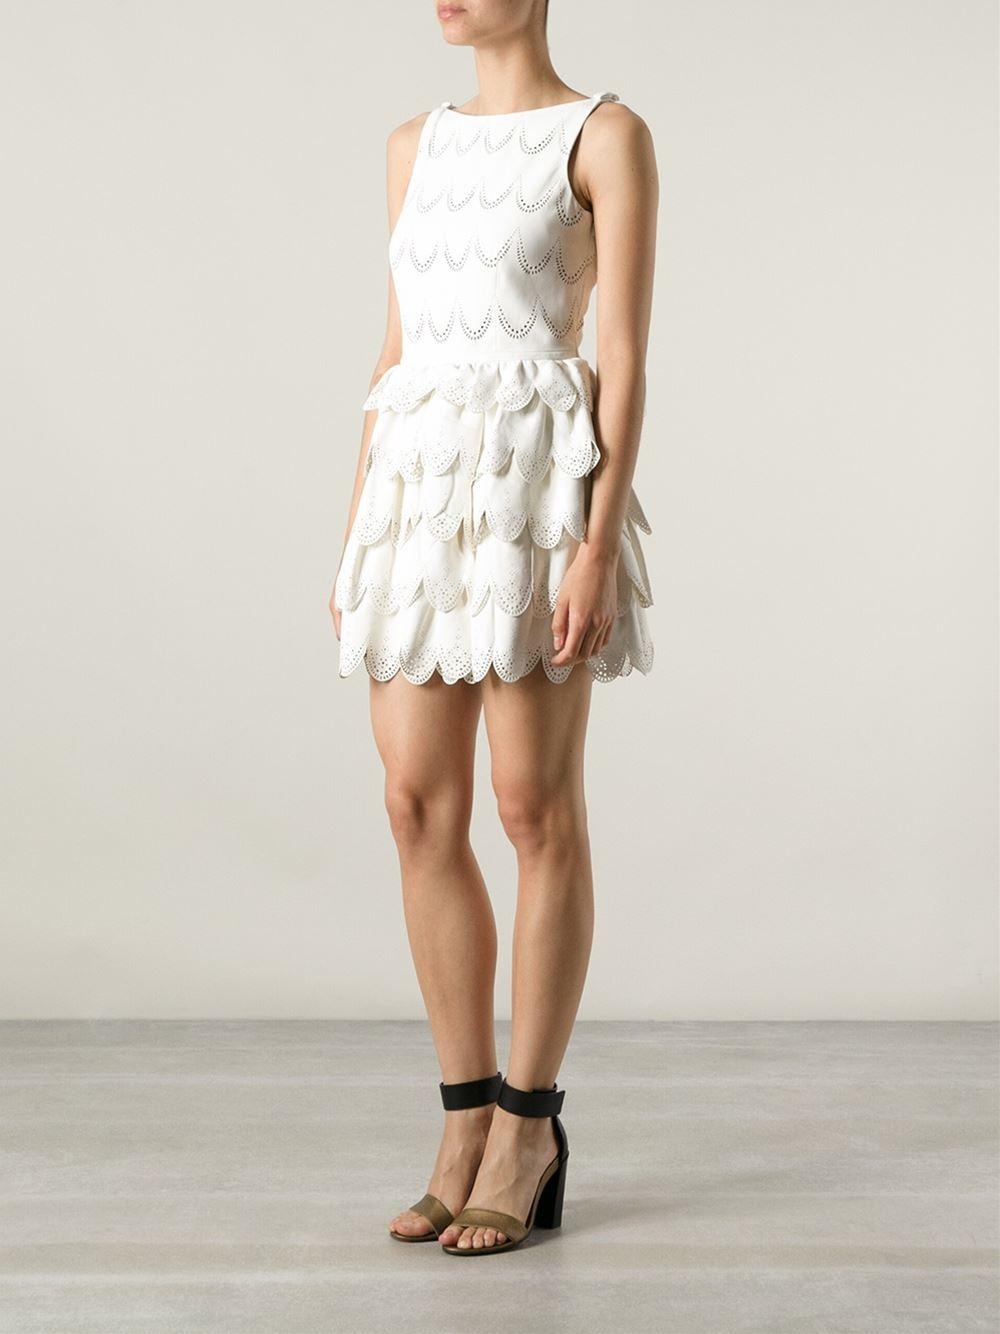 Dsquared2 Perforated Tiered Dress - Stefania Mode - Farfetch.com